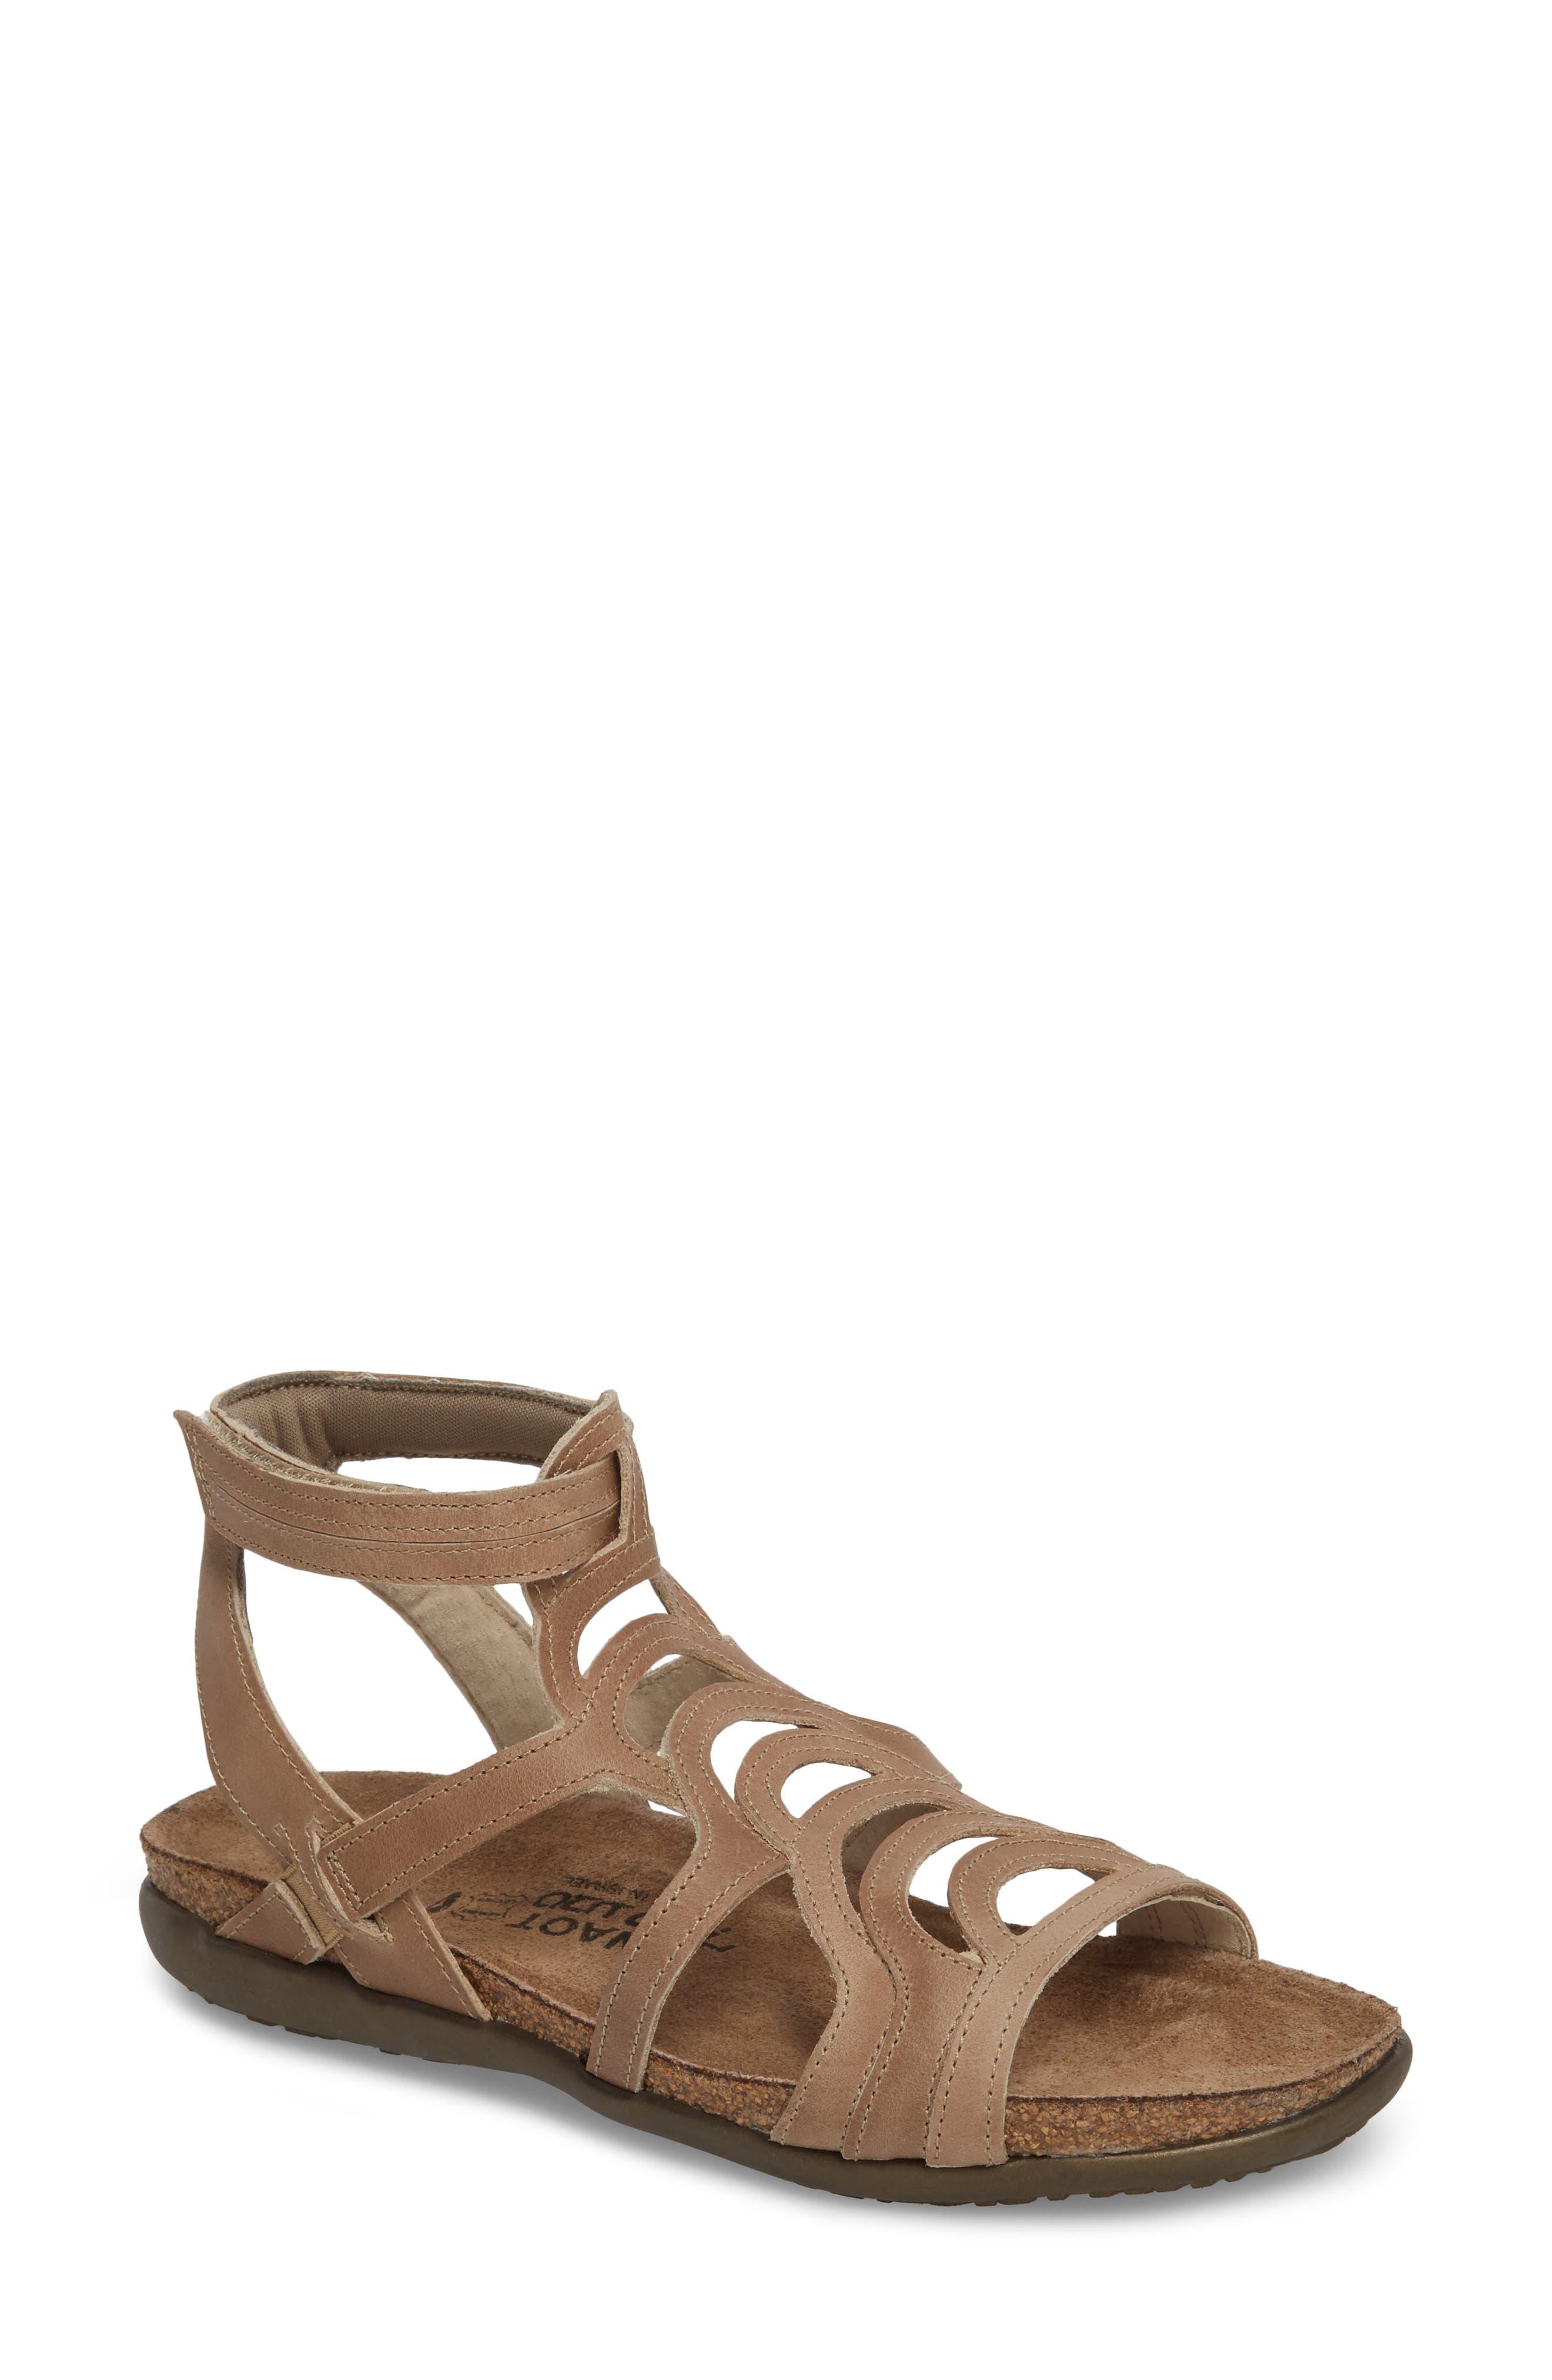 'Sara' Gladiator Sandal,                         Main,                         color, Khaki Beige Leather